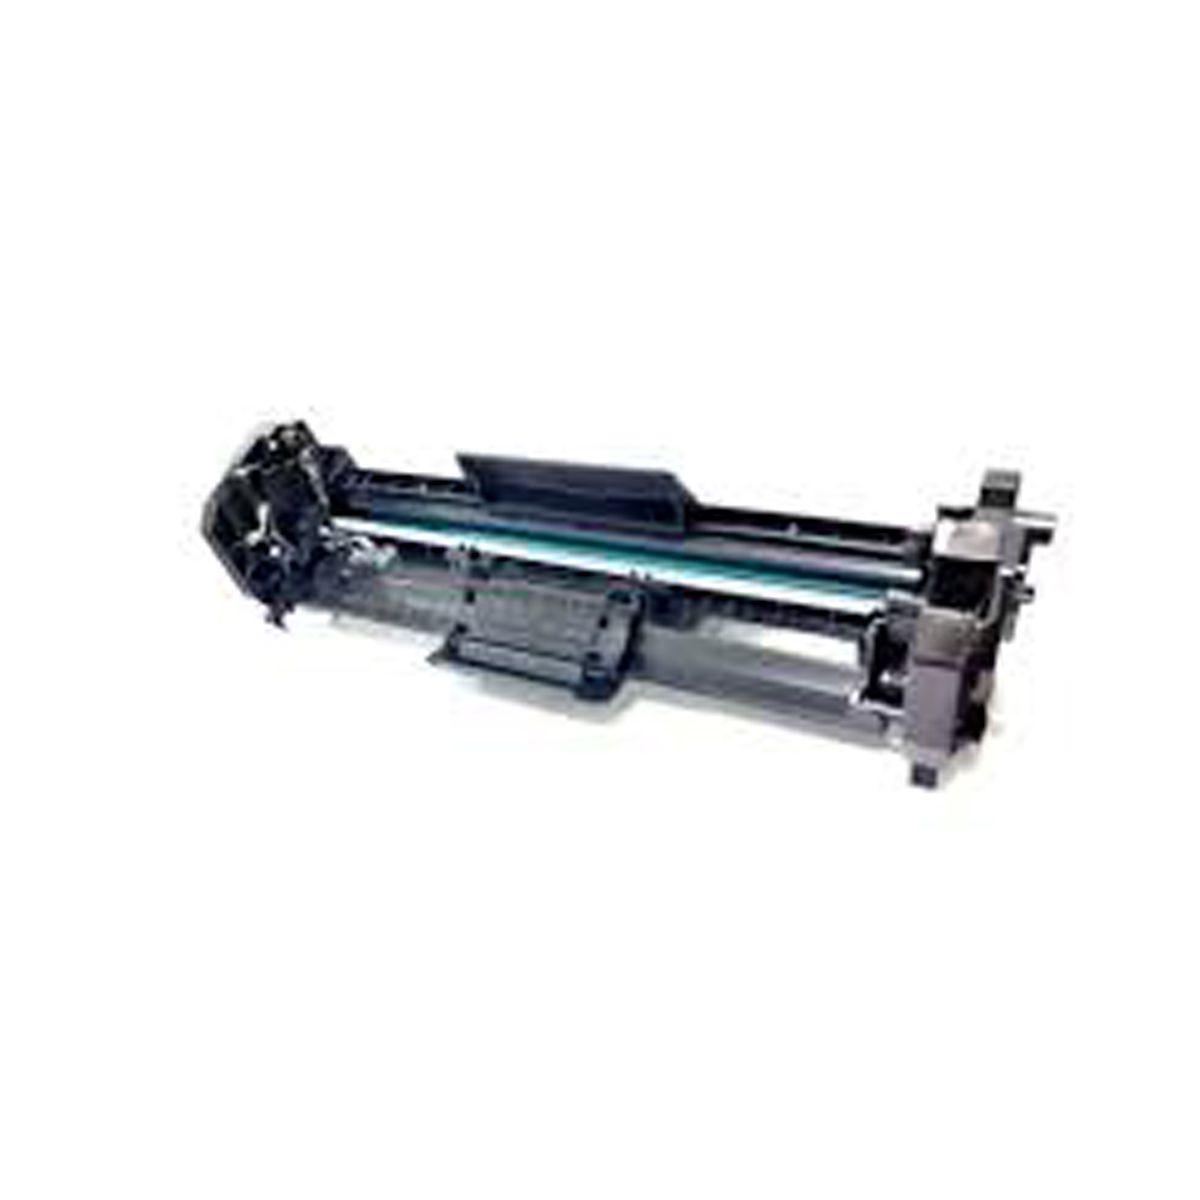 Fotocondutor CF234A CF234 34A - M106W M134A M134FN 106W 134A 134FN - 9.2k